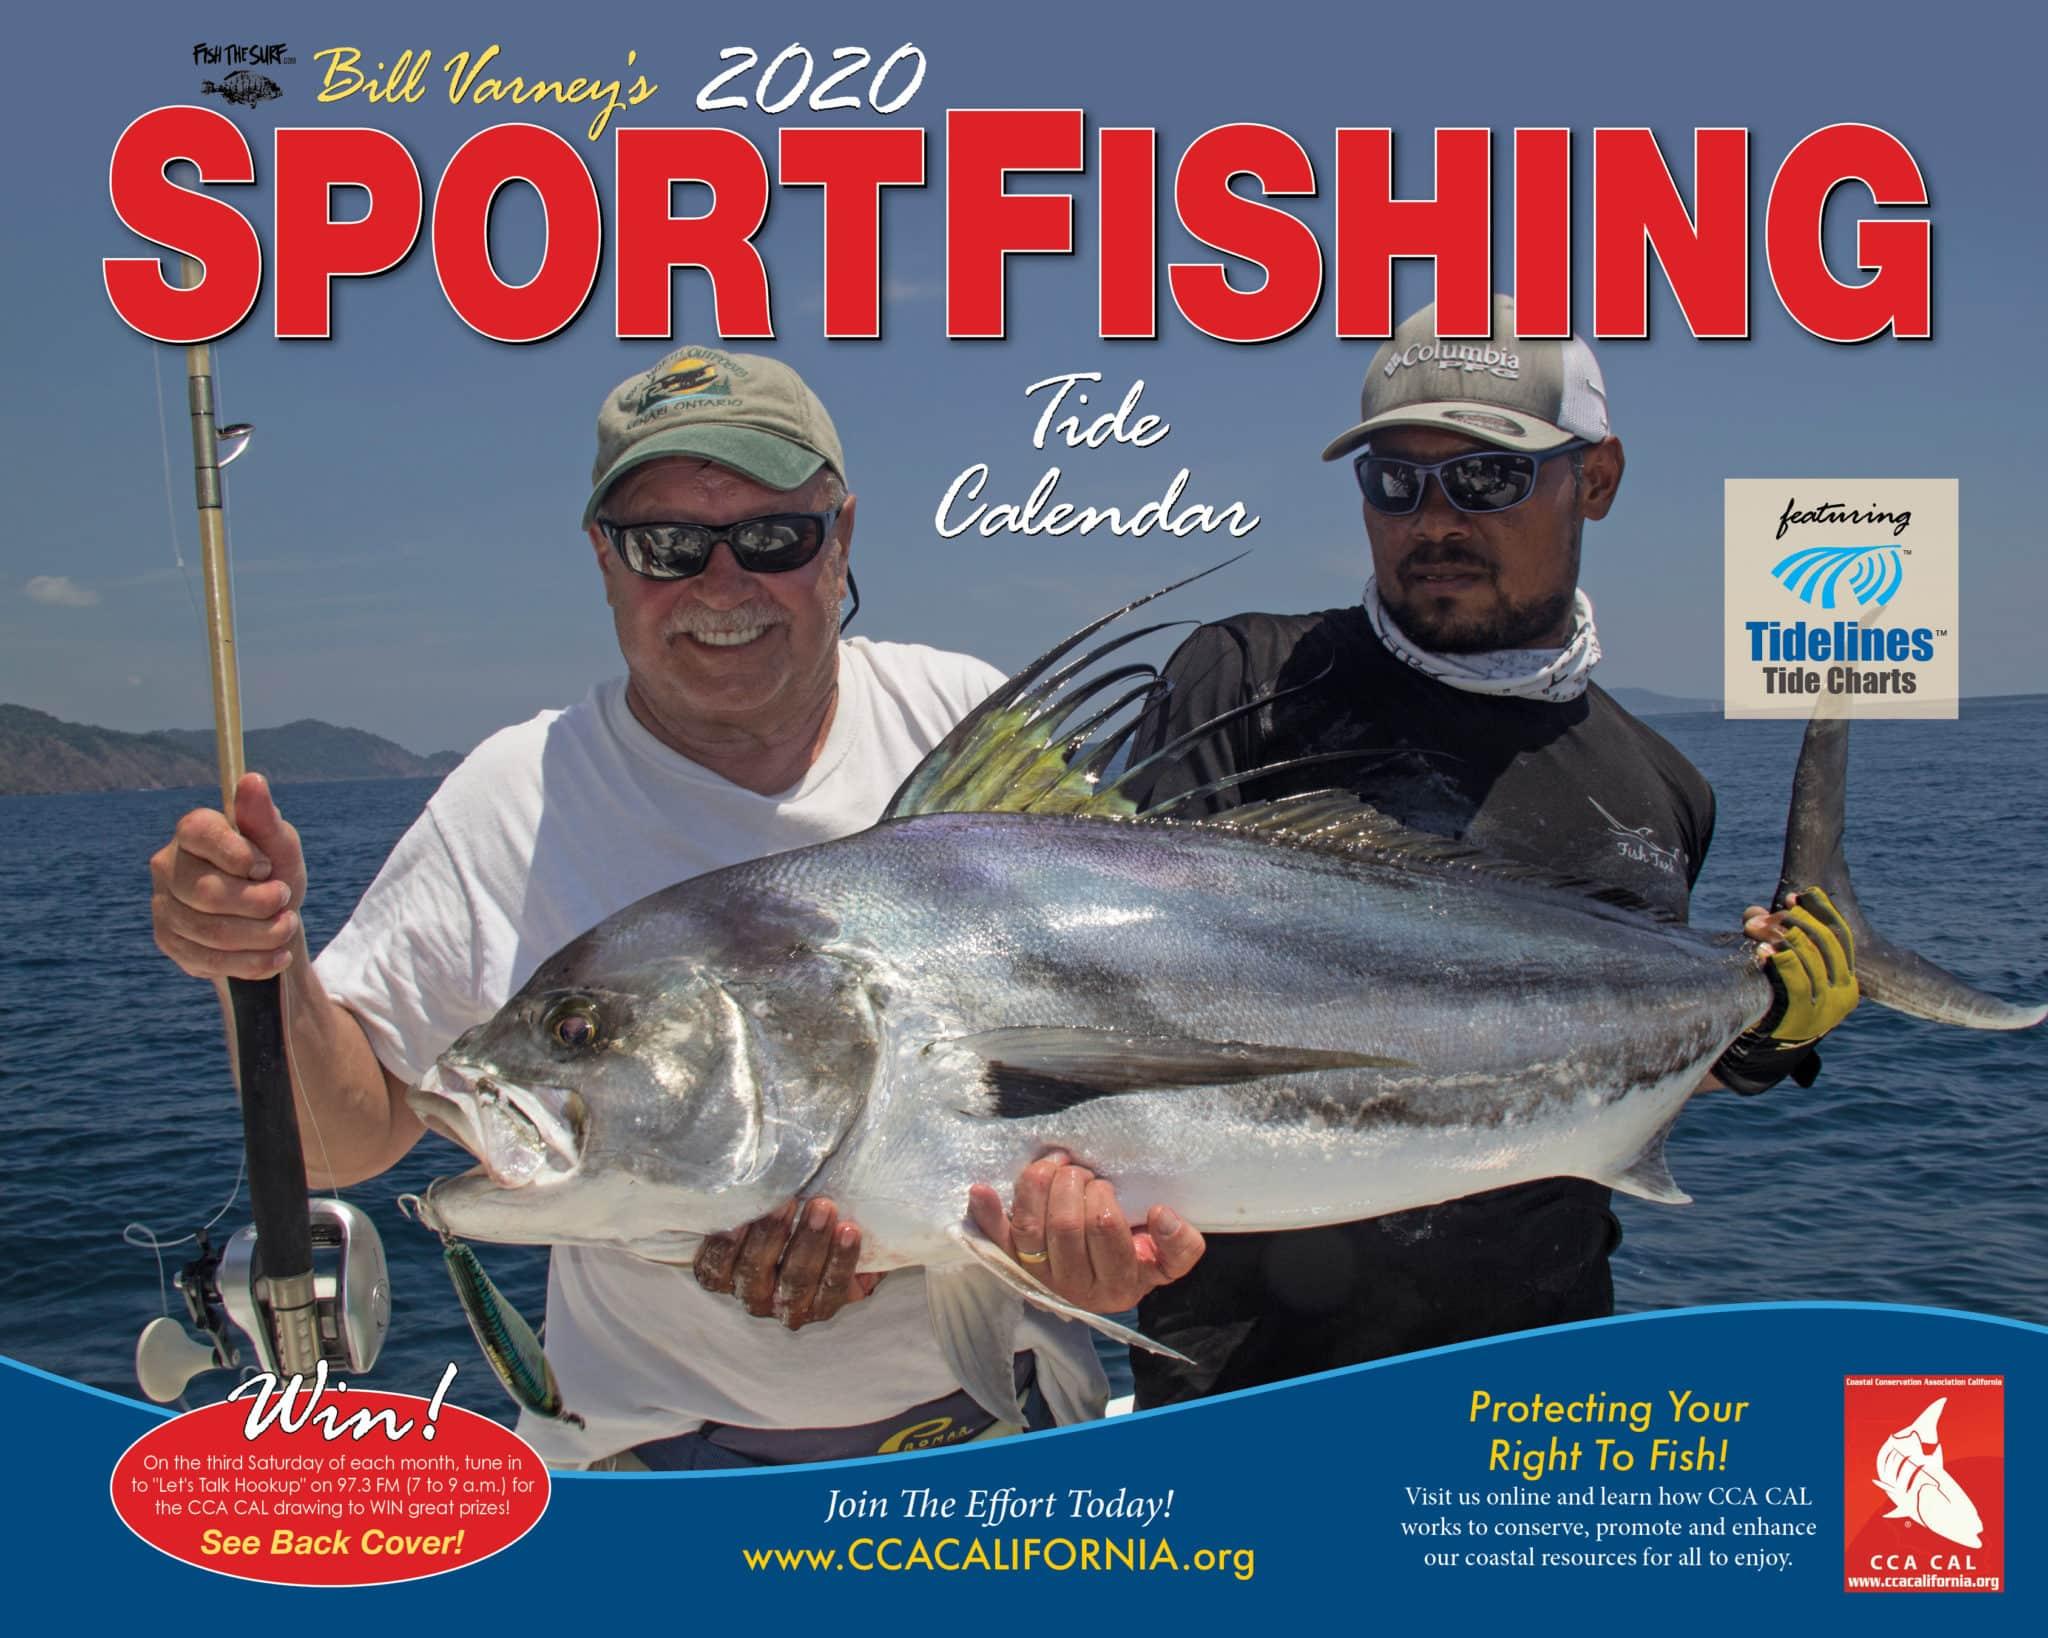 2020 CCA CAL Sportfishing Tide Calendar